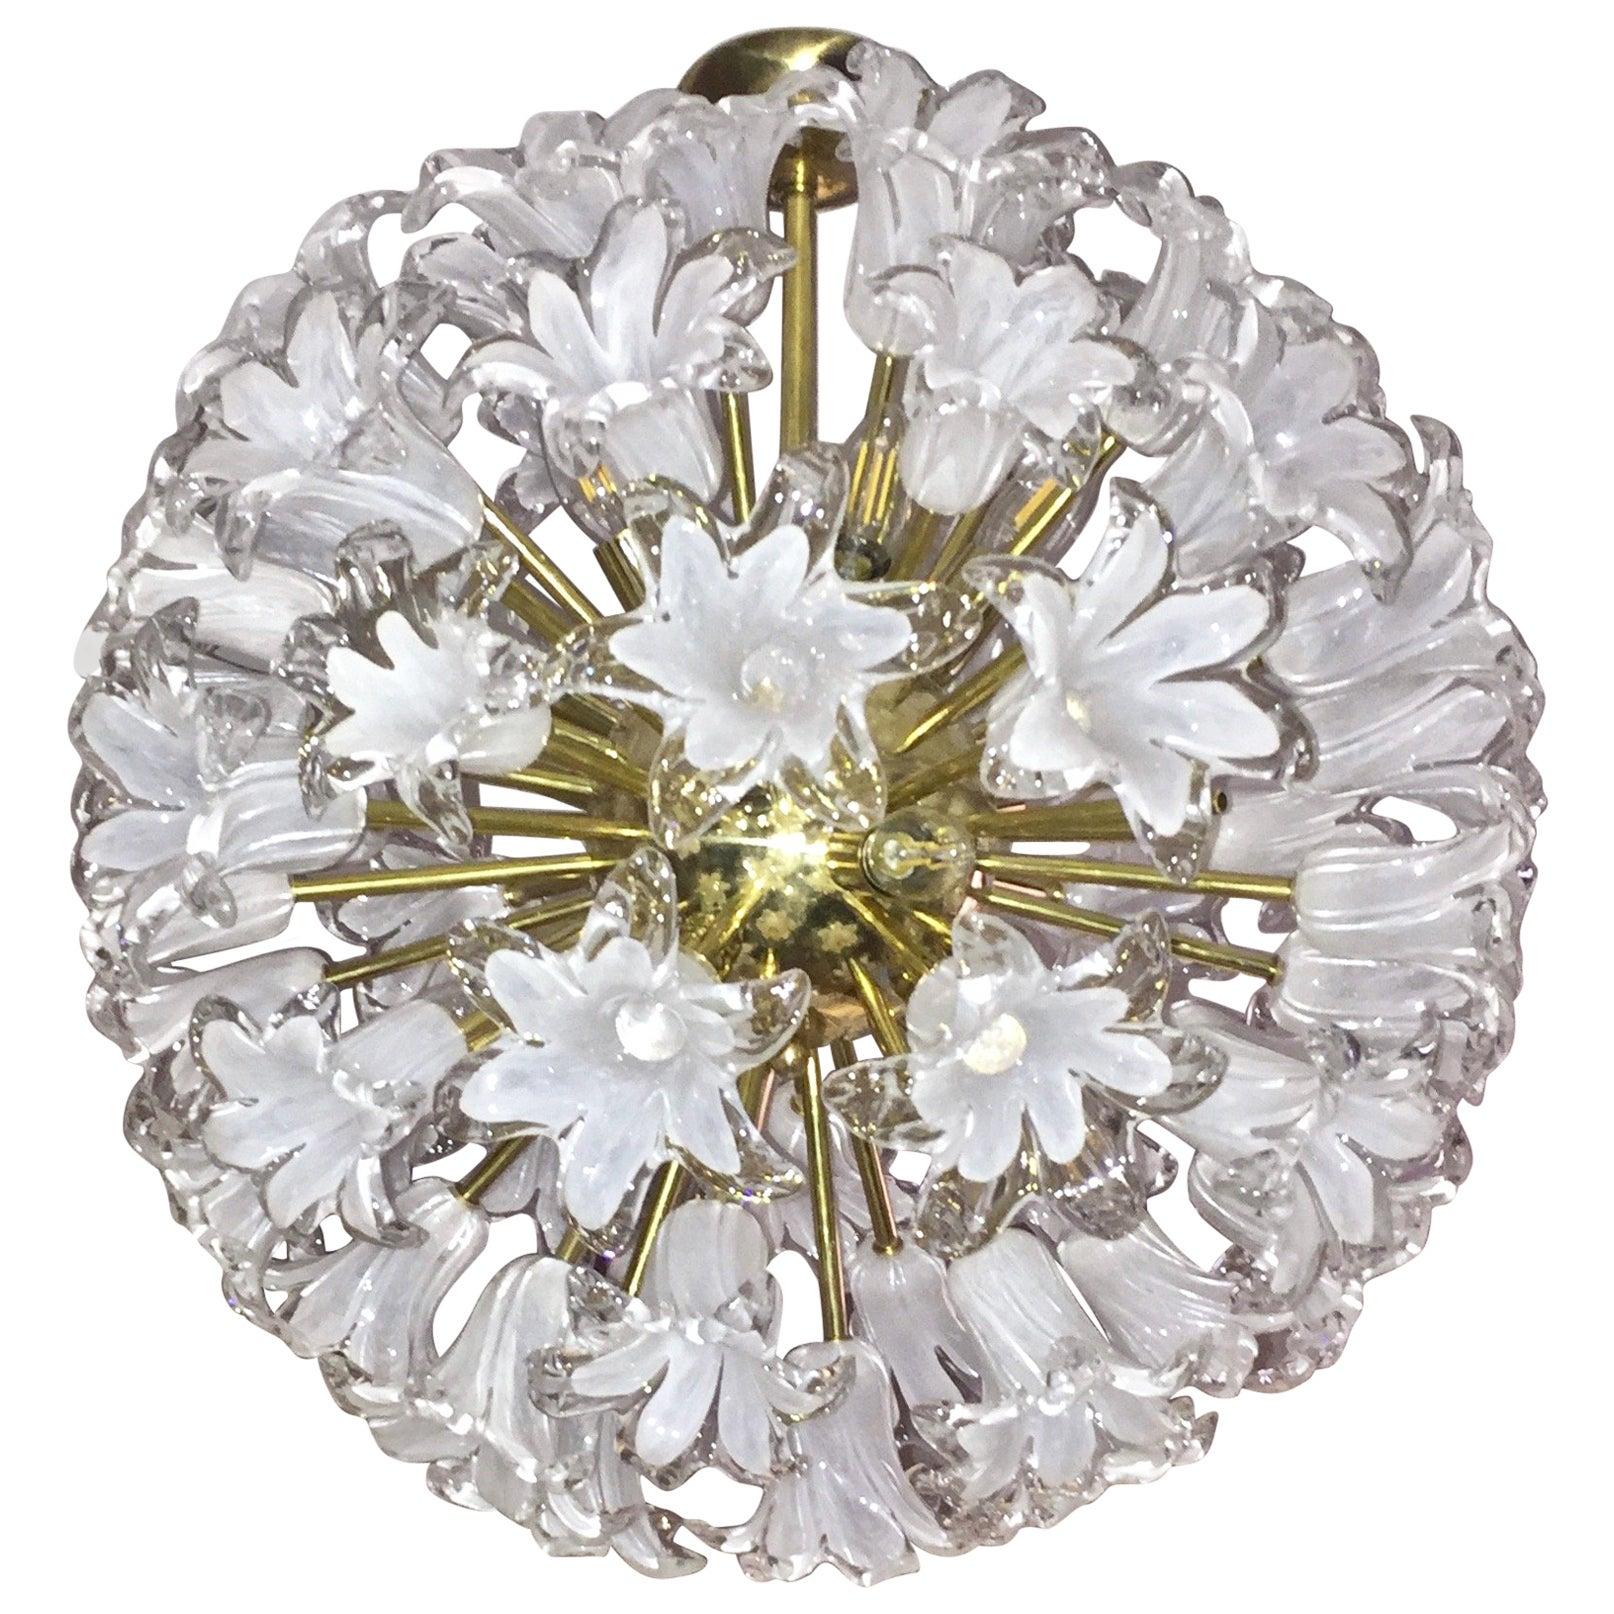 Contemporary Italian White Murano Glass and Brass Sputnik Bud Flower Chandelier